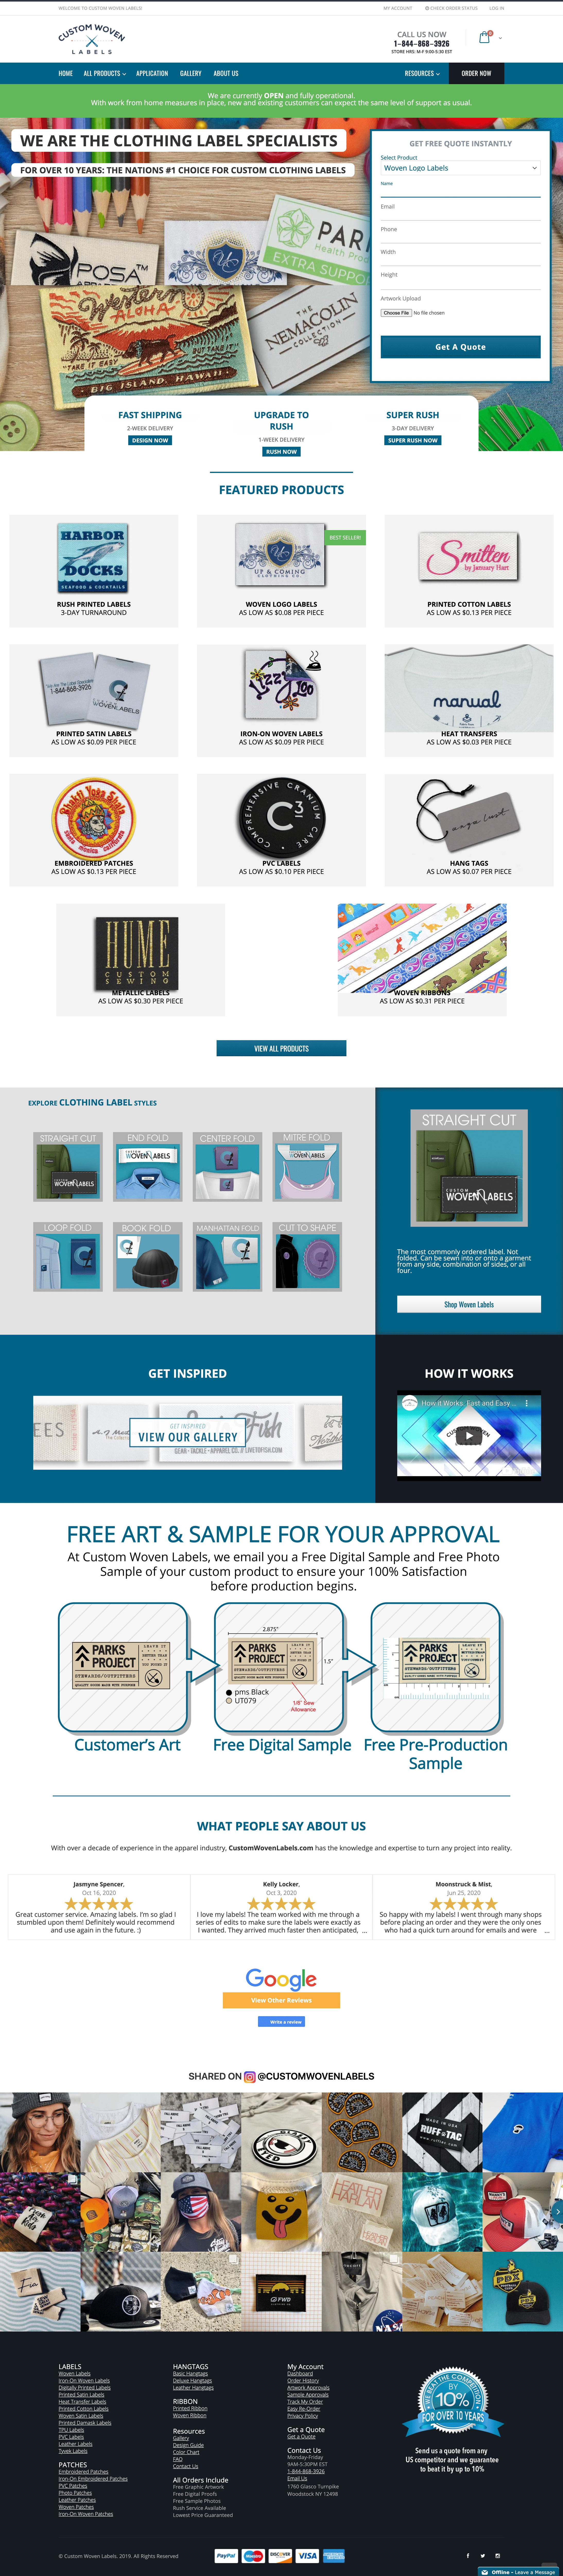 Custom Woven Labels - Full Website Layout by Ok Omni